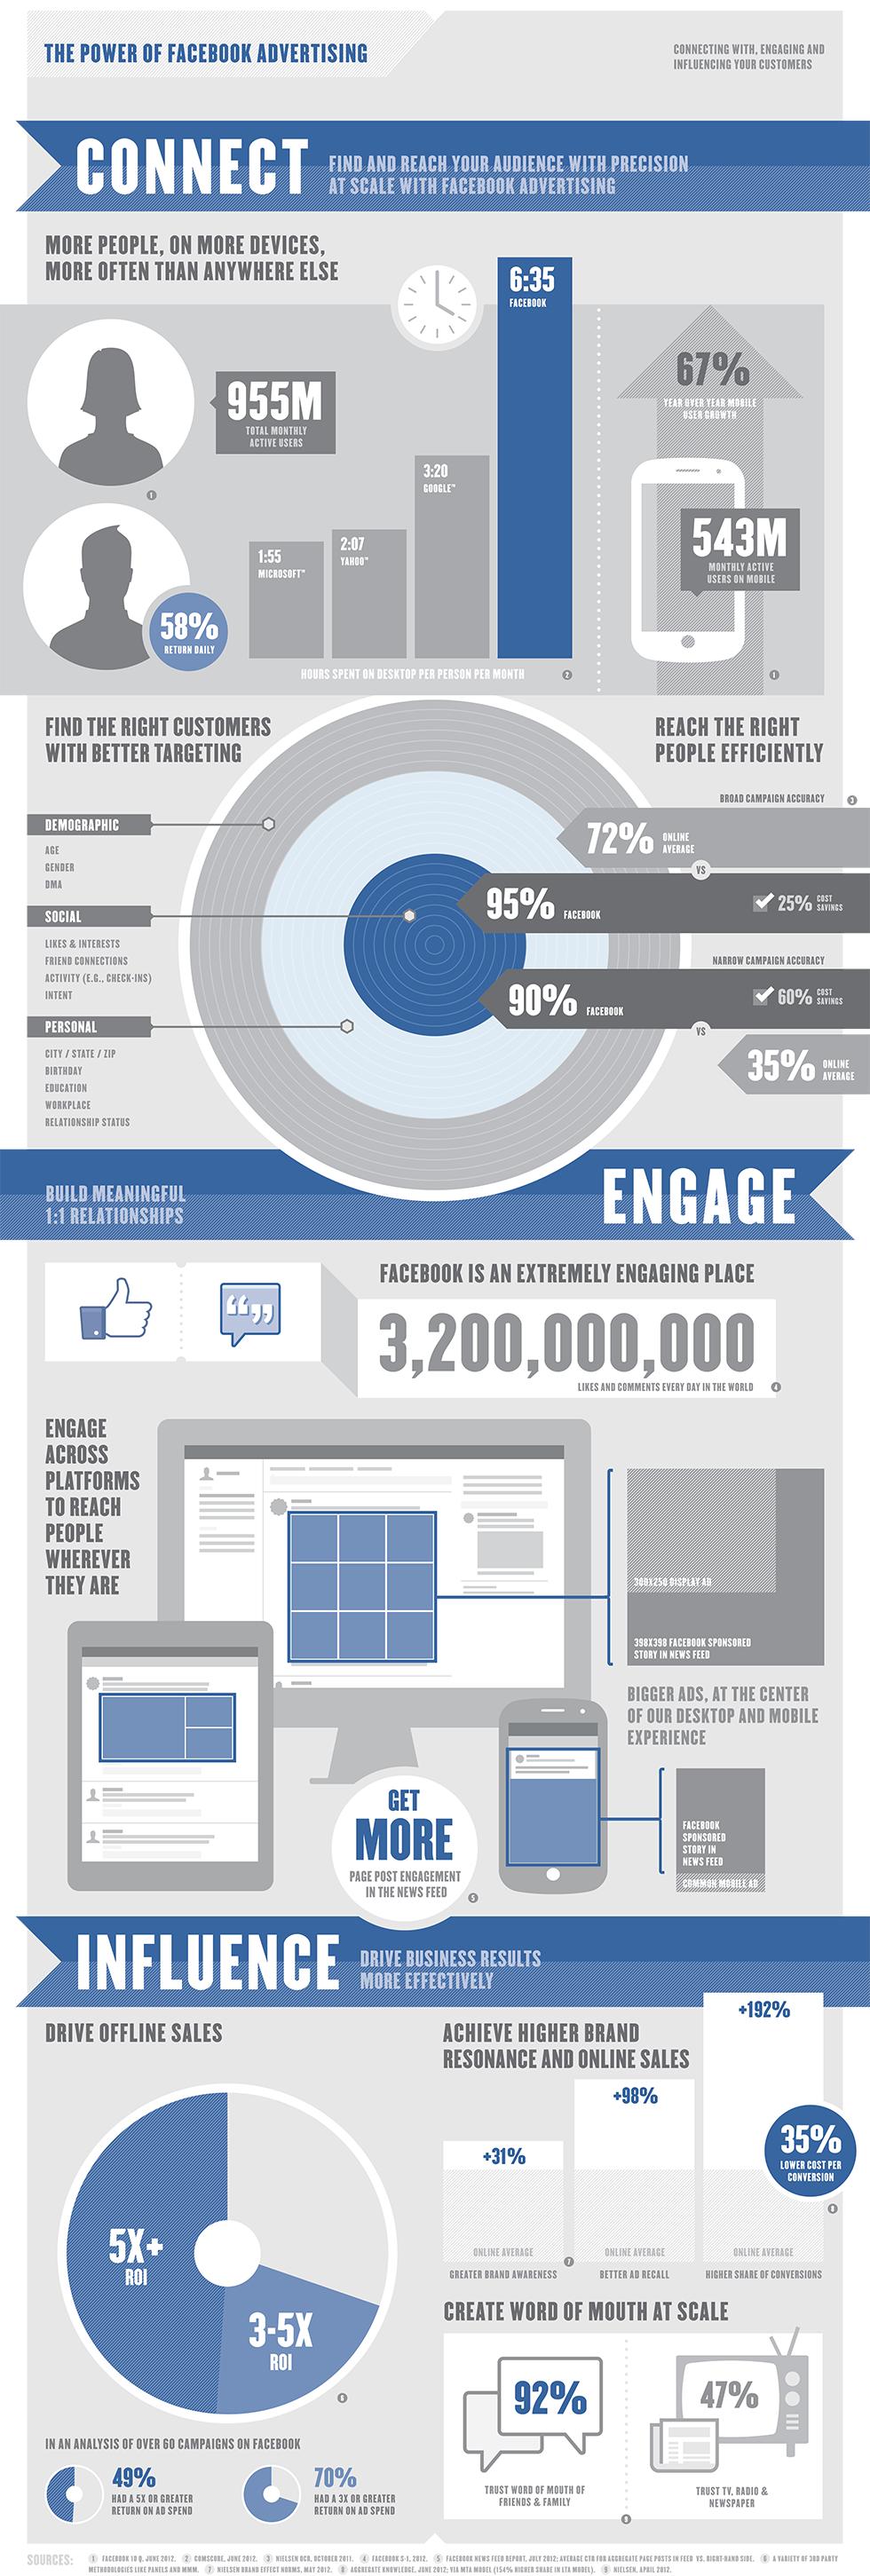 Facebook Ads, Facebook, Fans